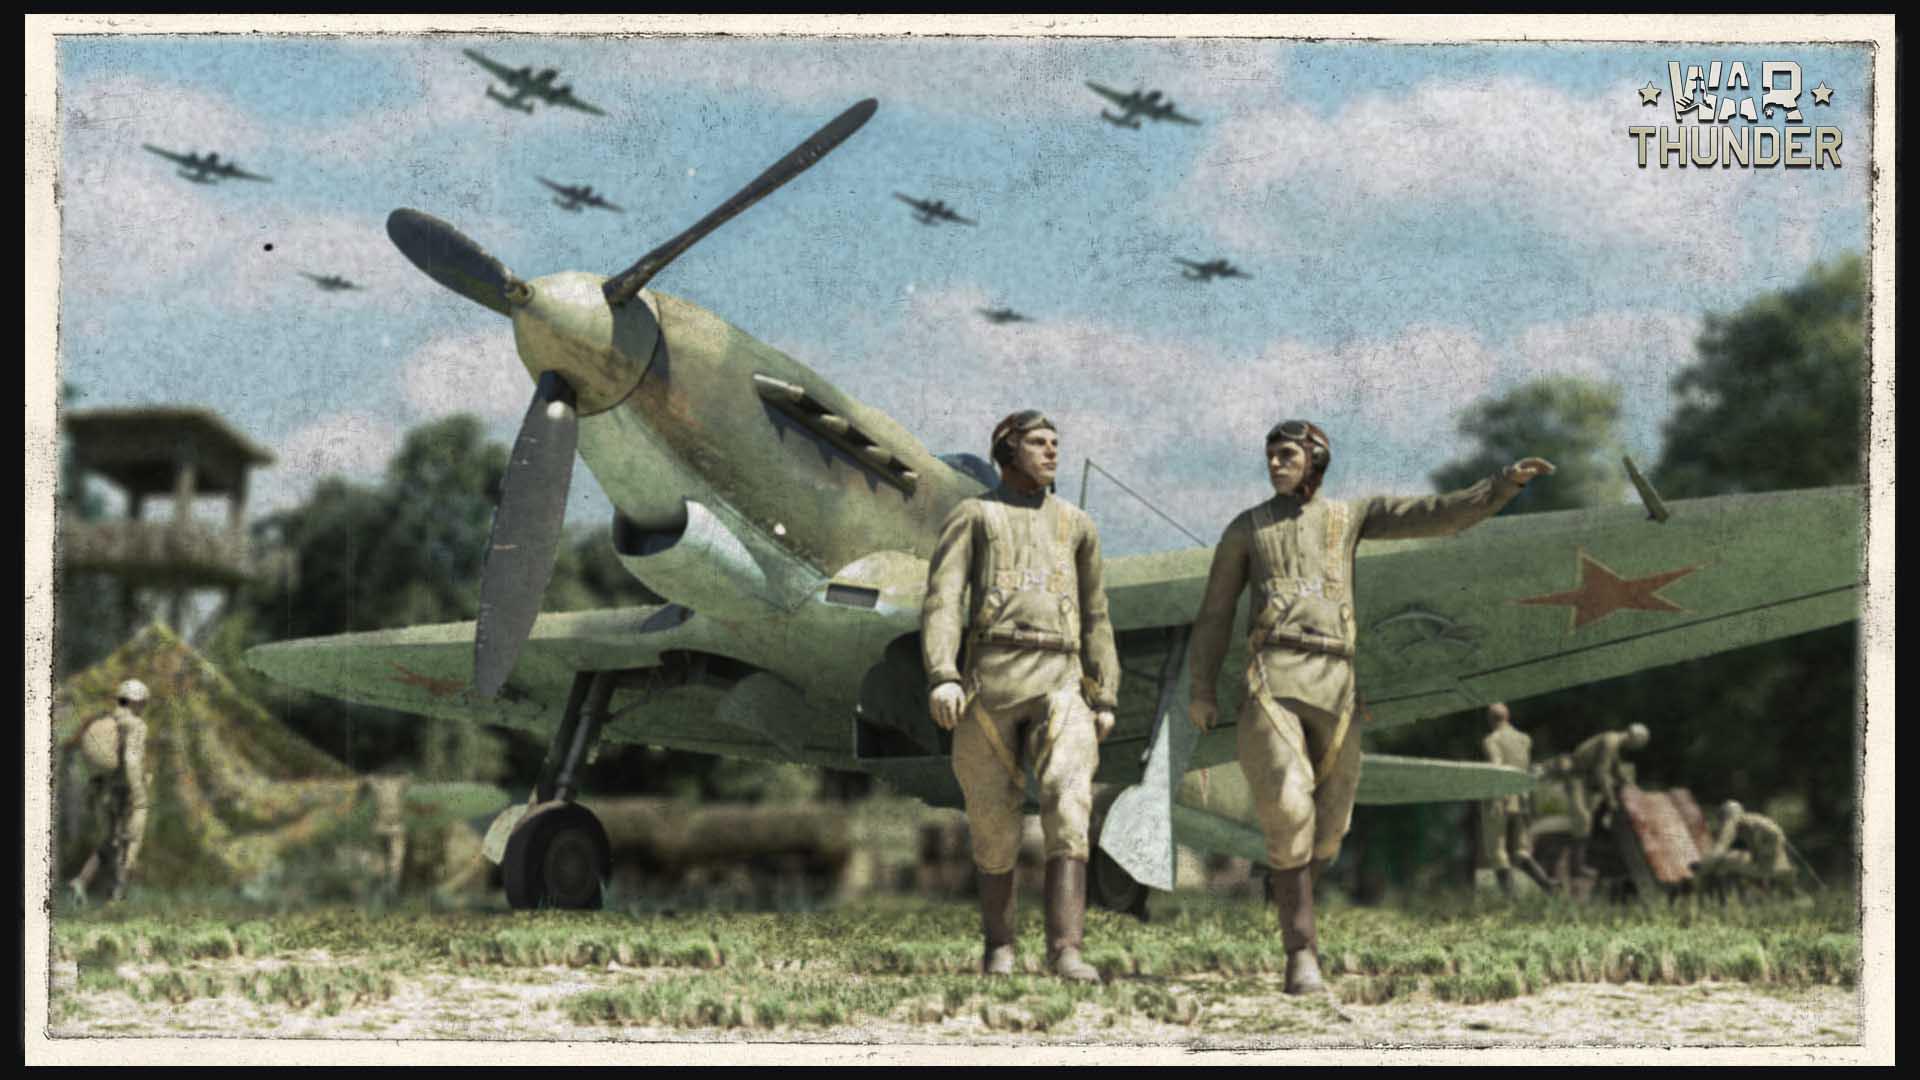 Free War Thunder Wallpaper in 1920x1080